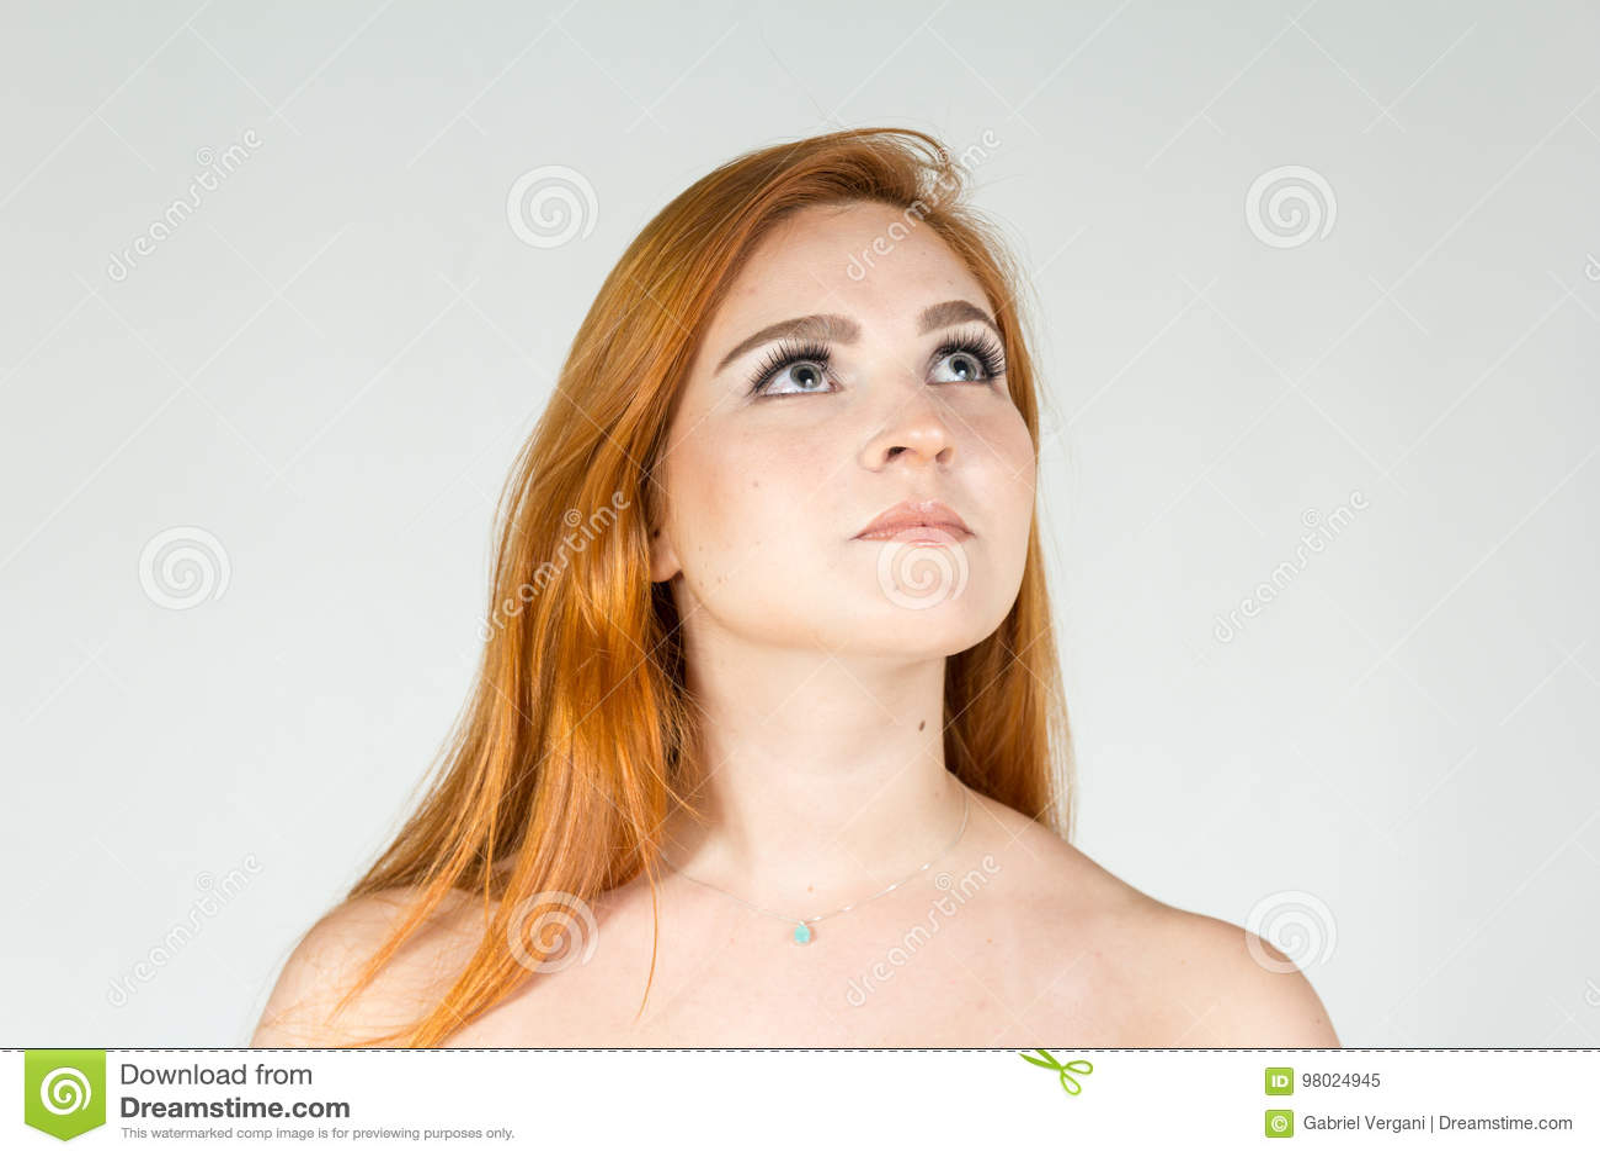 recherche jeune fille blanche